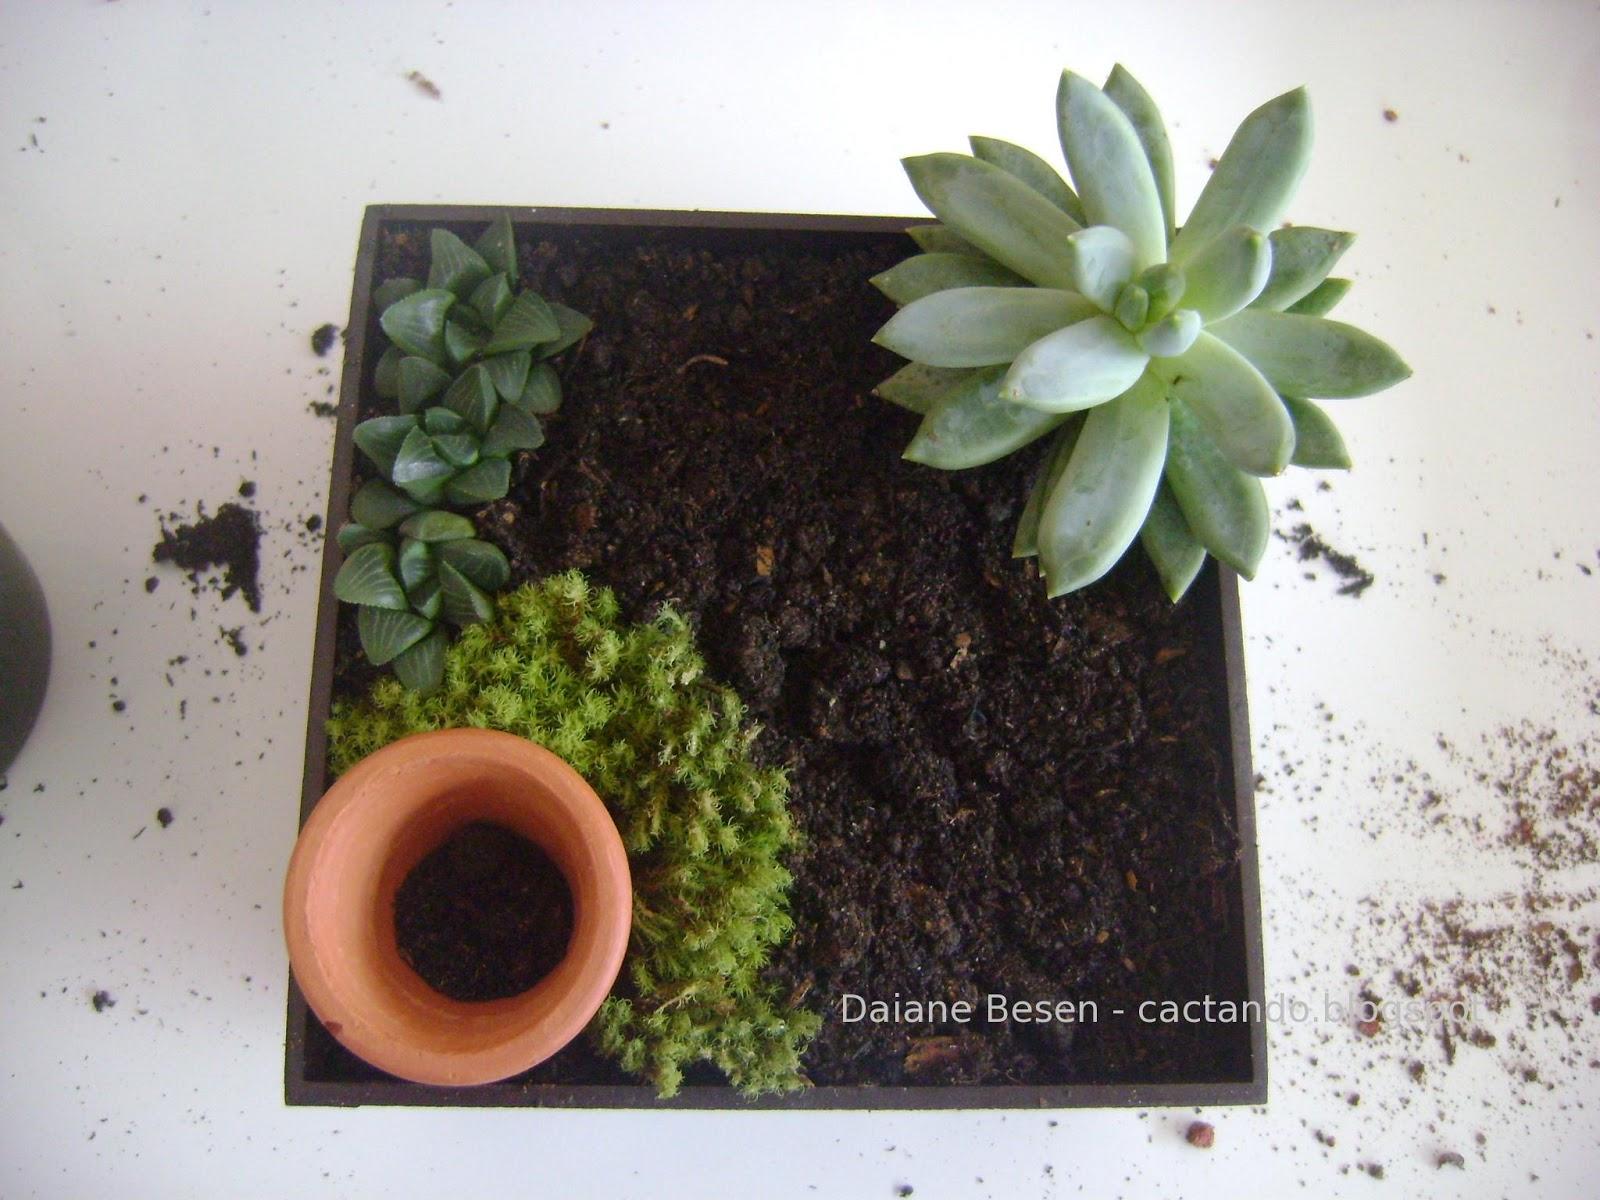 mini jardim de suculentas passo a passo : mini jardim de suculentas passo a passo:Mini jardim – passo a passo